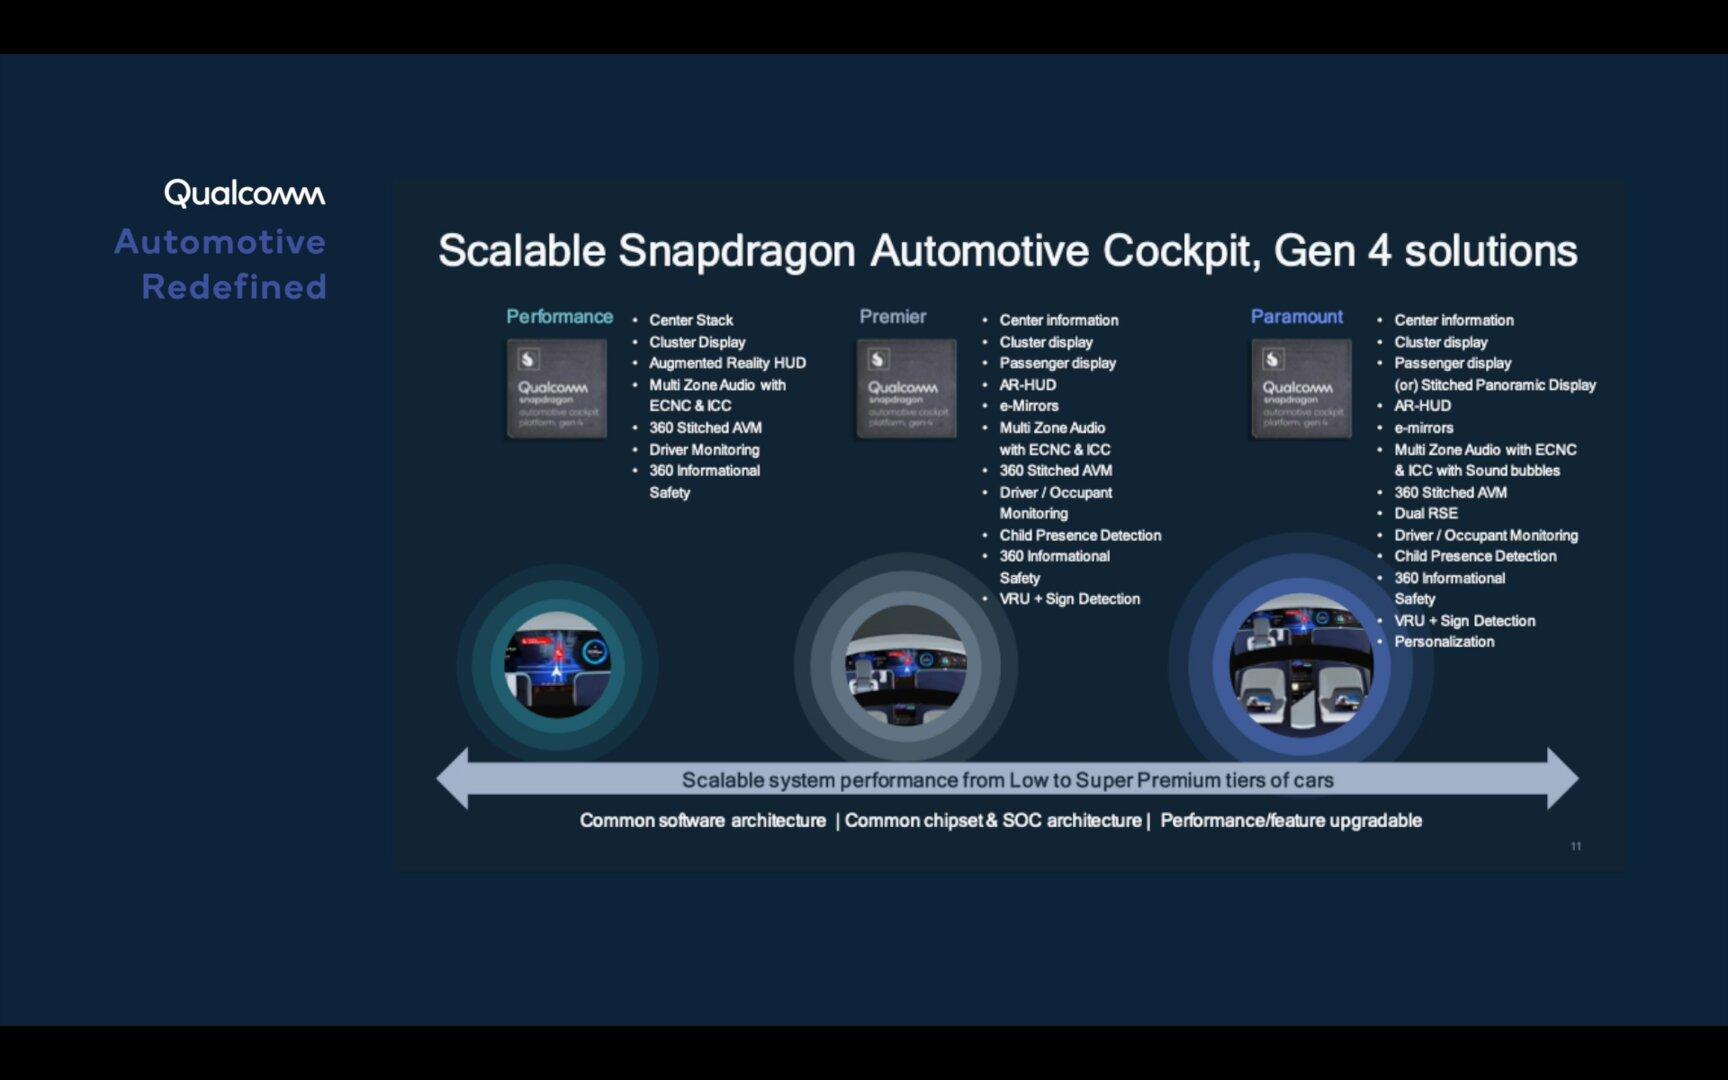 Abstufungen der Snapdragon Automotive Cockpit Platforms